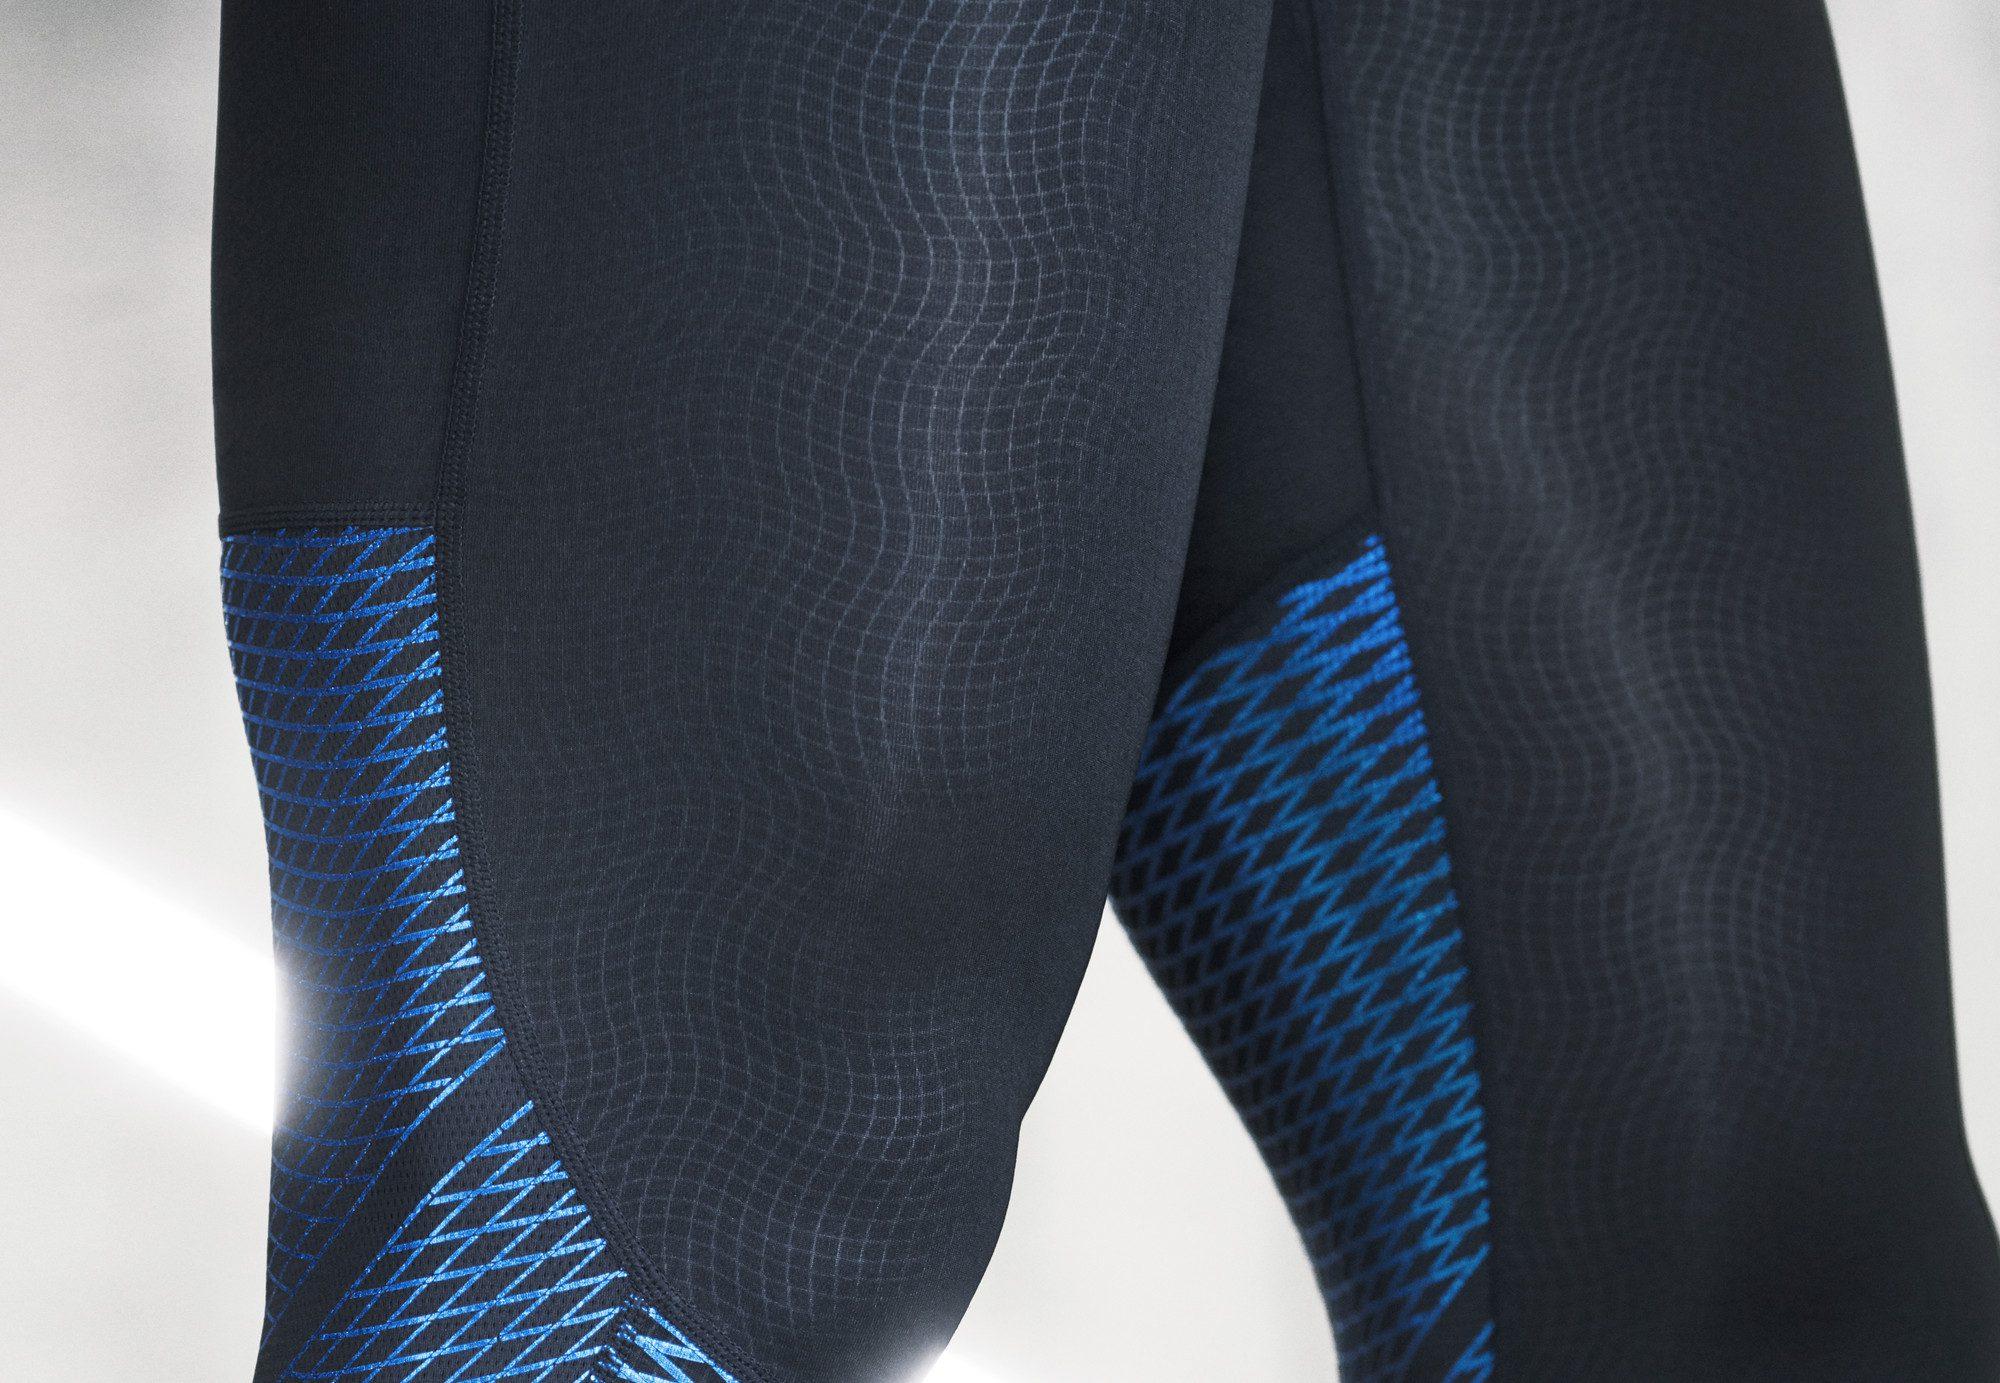 SP16_BSTY_Tights_NikePro_HypercoolMax_Detail2_02_50157.jpg